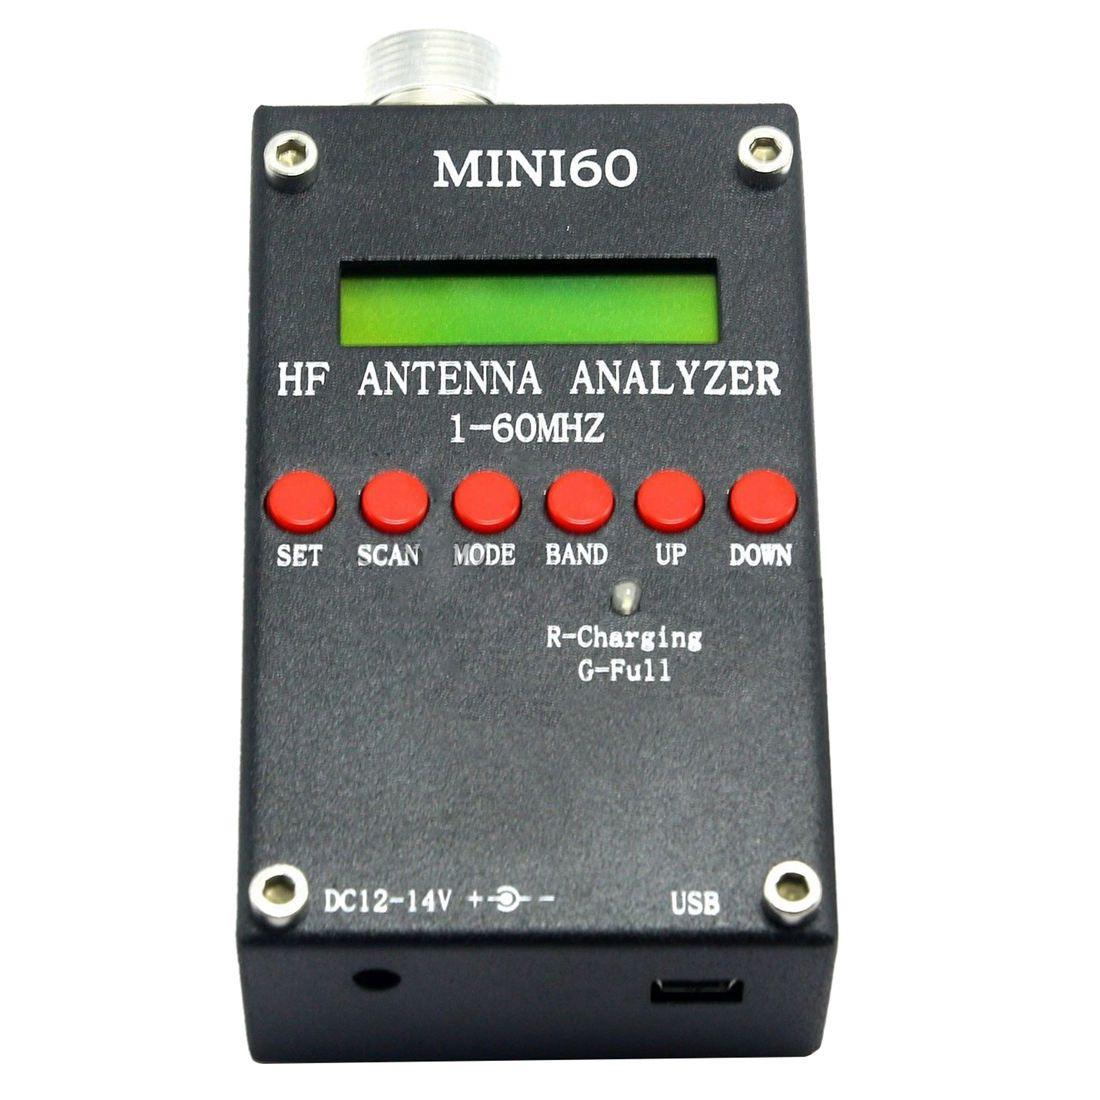 Mini60 Sark100 HF ANT SWR Antenna Analyzer Meter Bluetooth Android APP Black